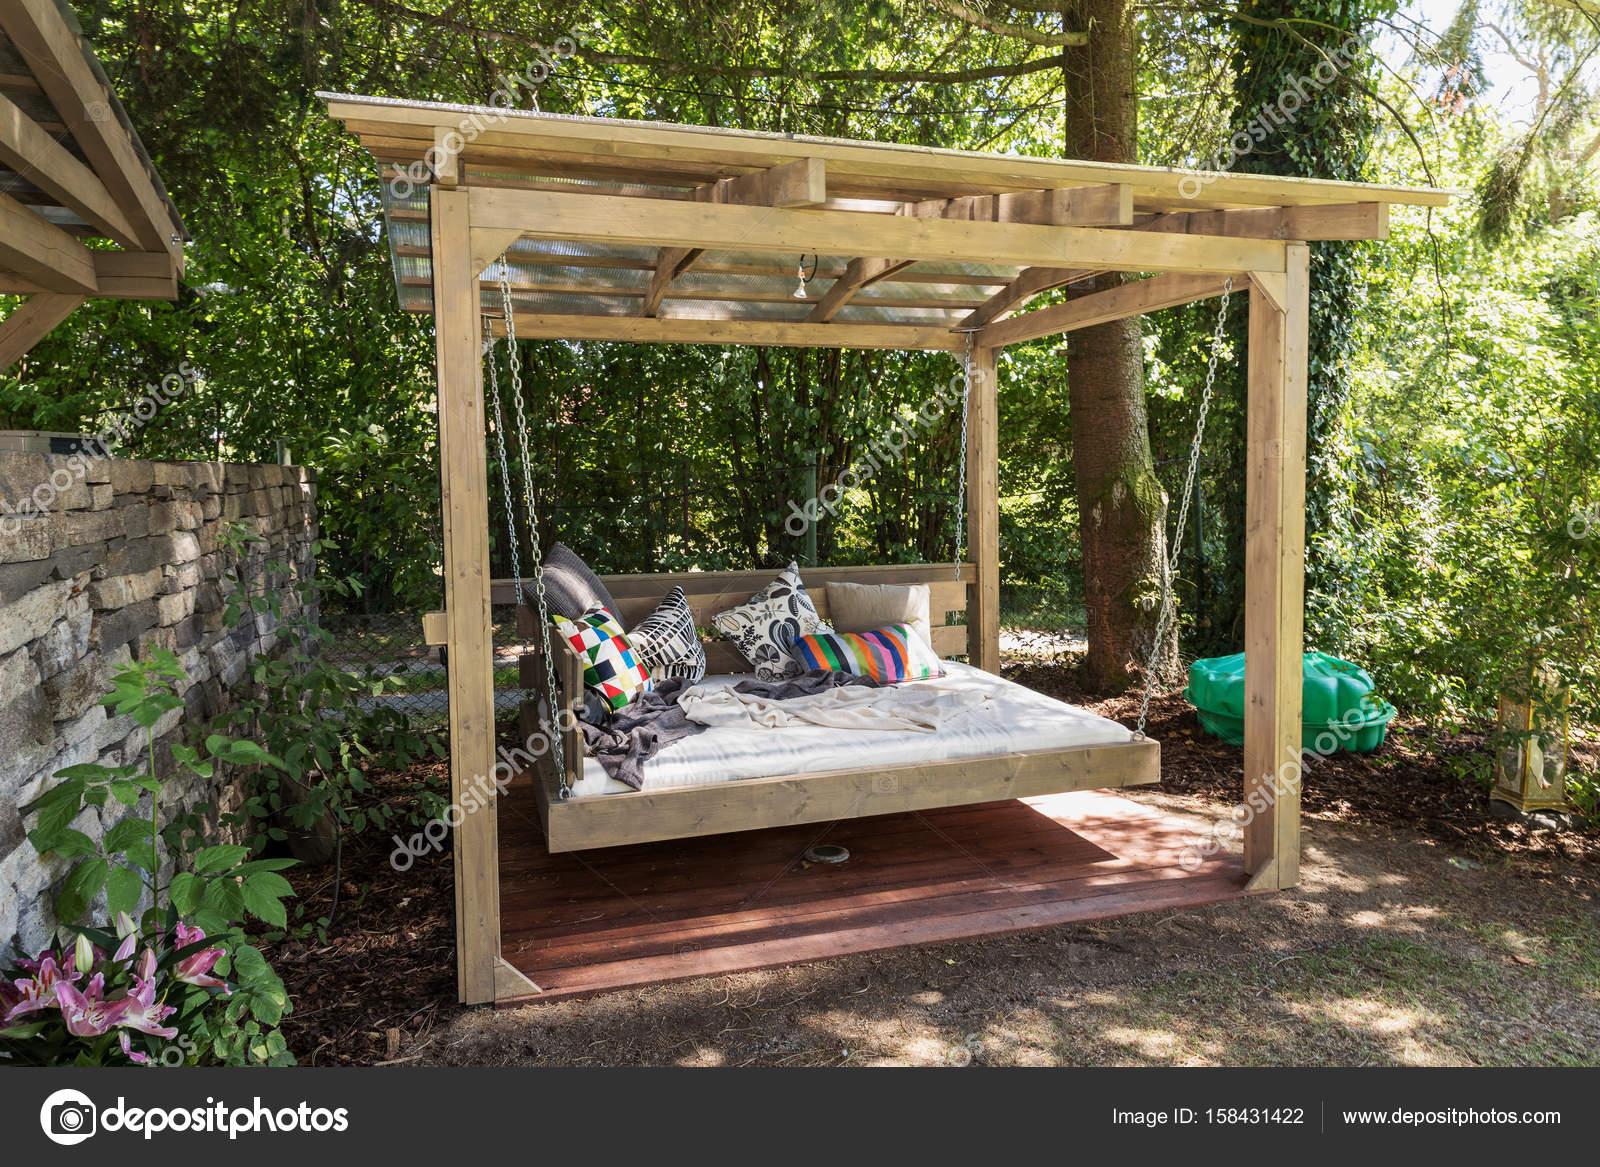 rocking bed pergola. garten-bett mit kissen — stockfoto © nadak2